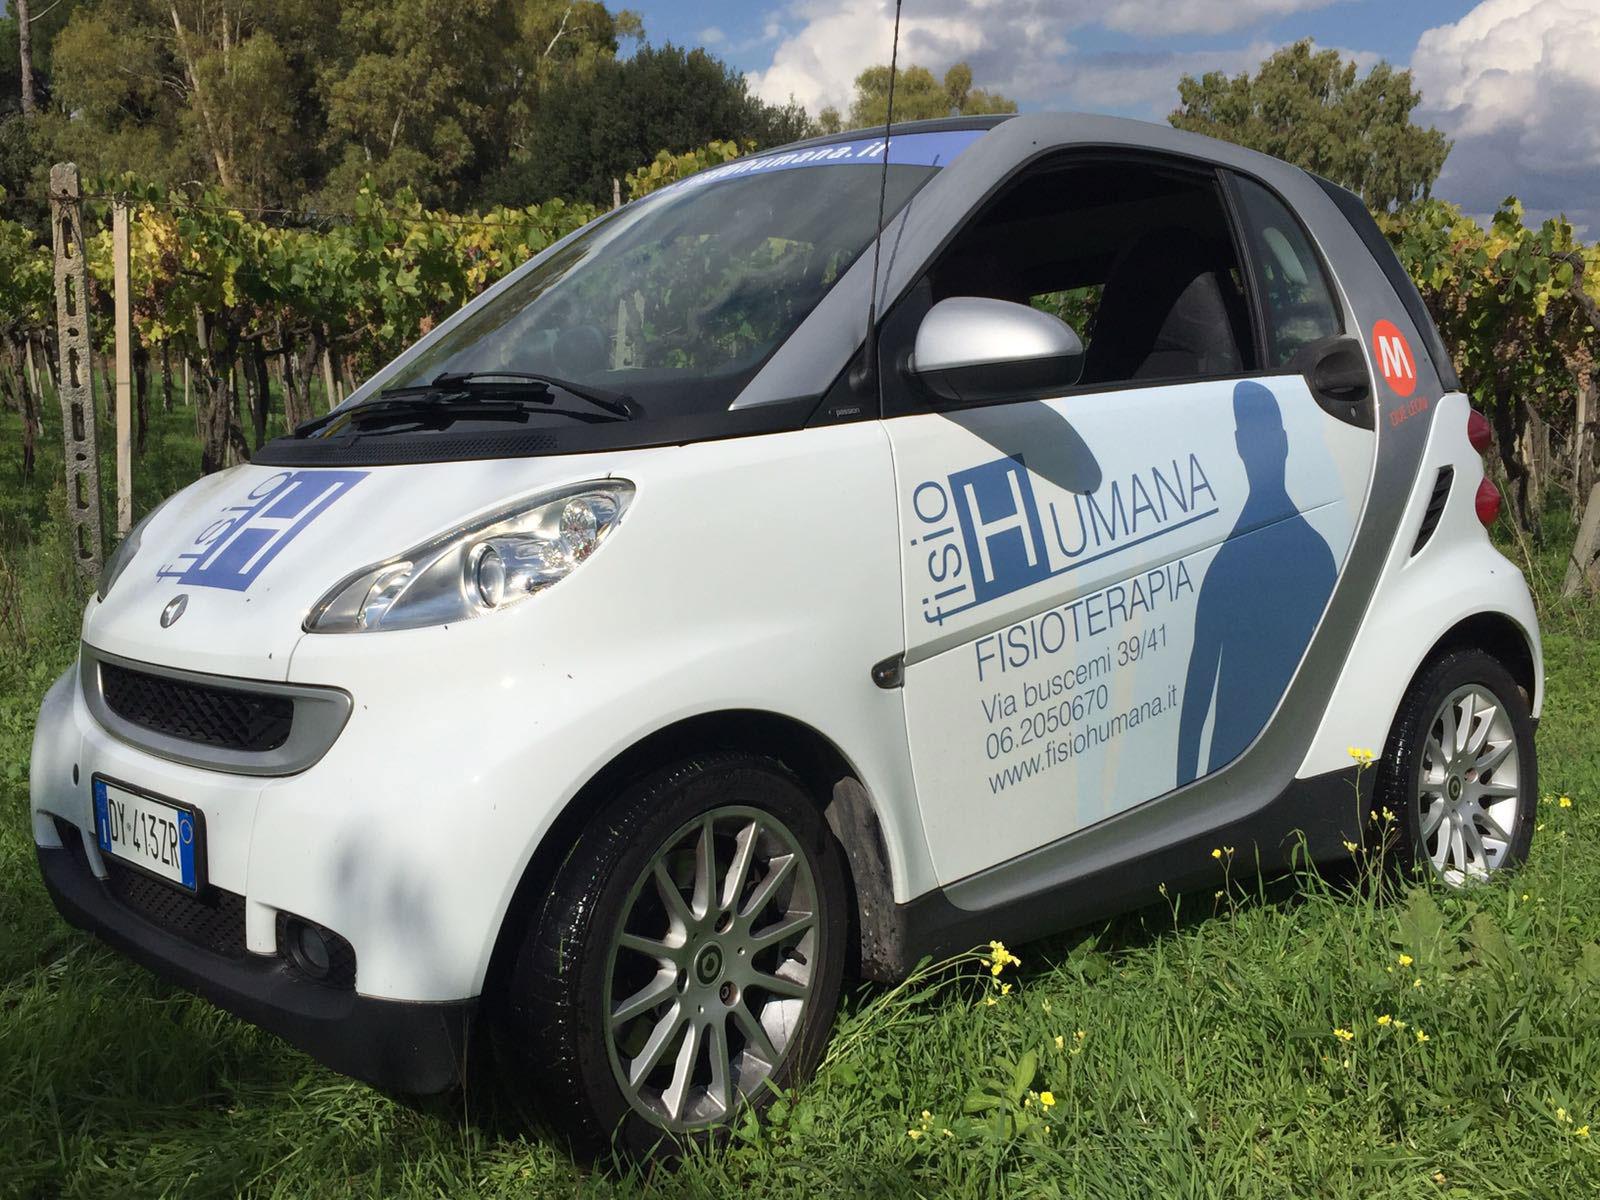 car-design-smart-fisiohumana